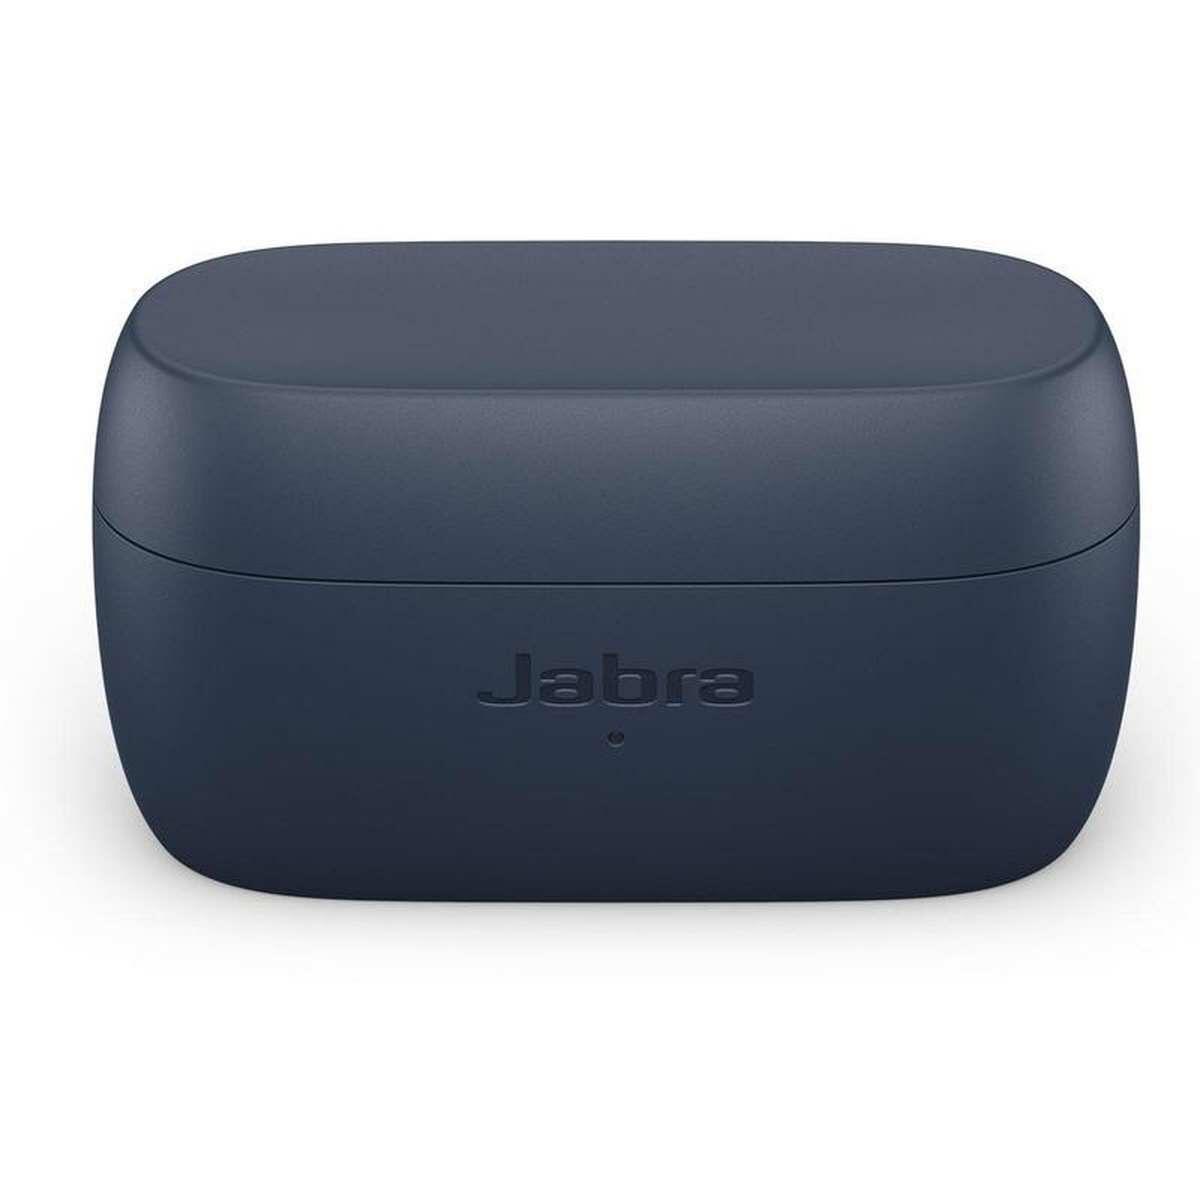 Jabra Elite 3 Wireless Earbuds, fülhallgató navy kék EU